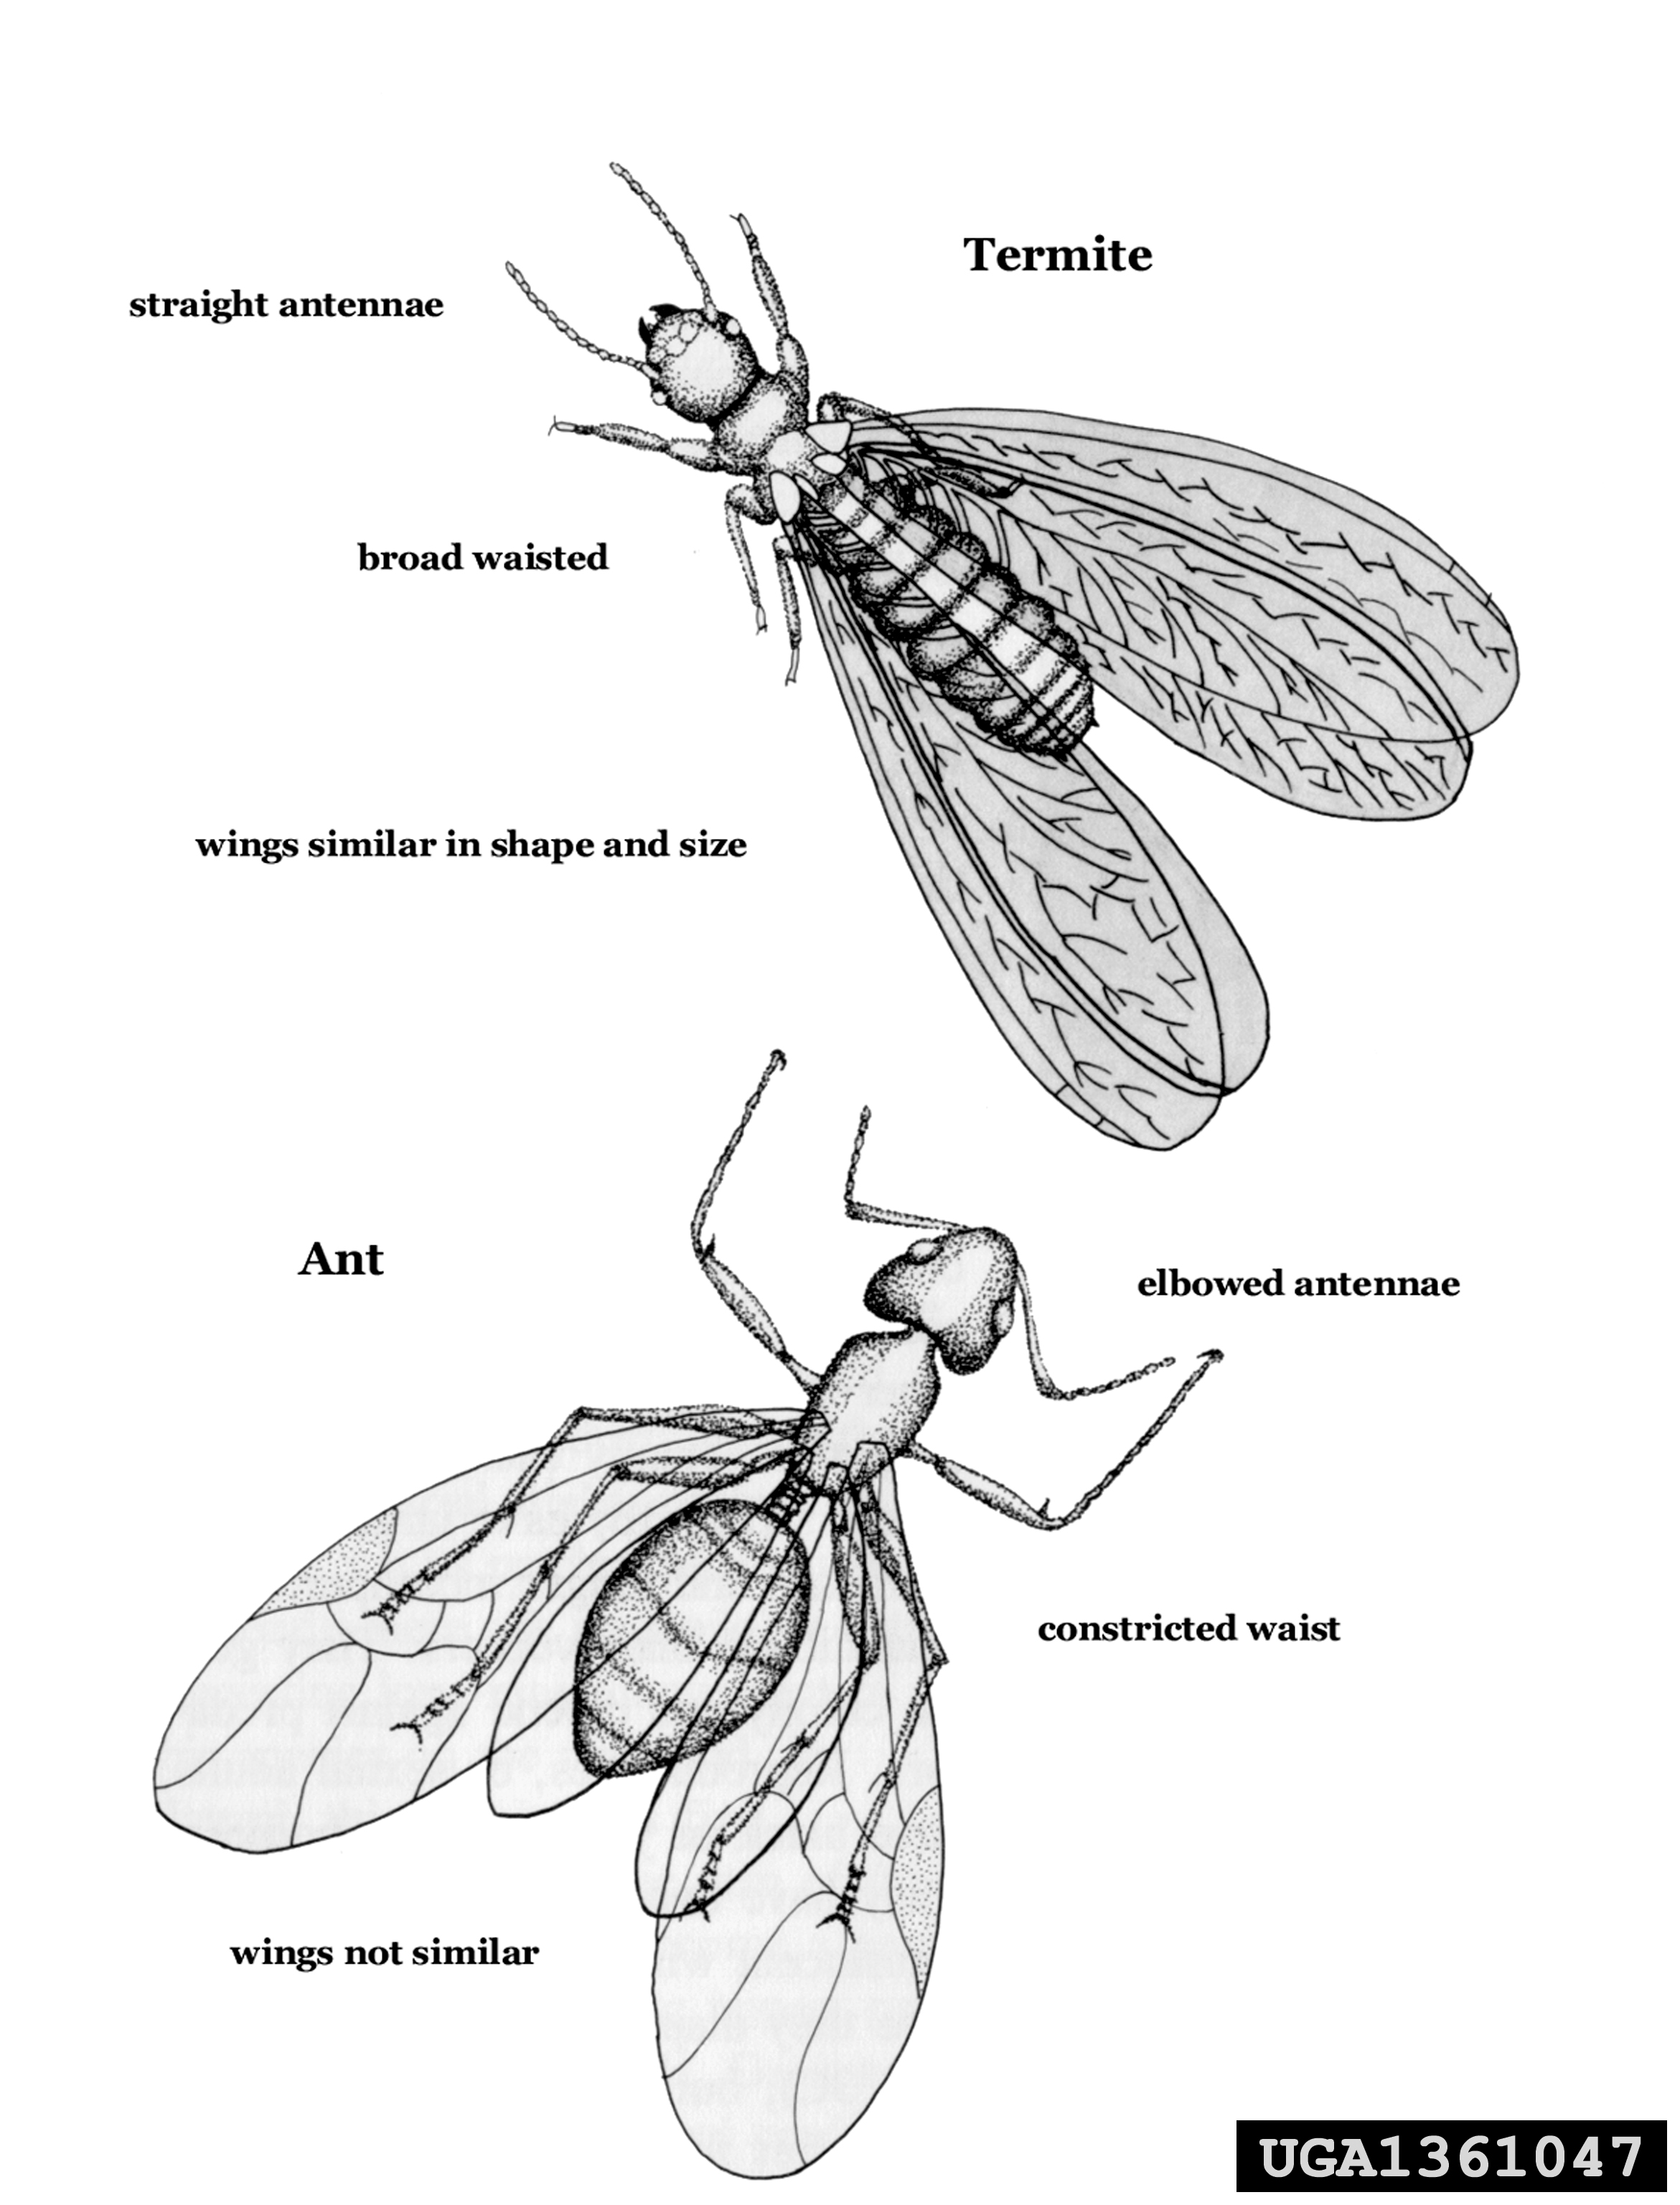 Termite Vs Ant Illustration